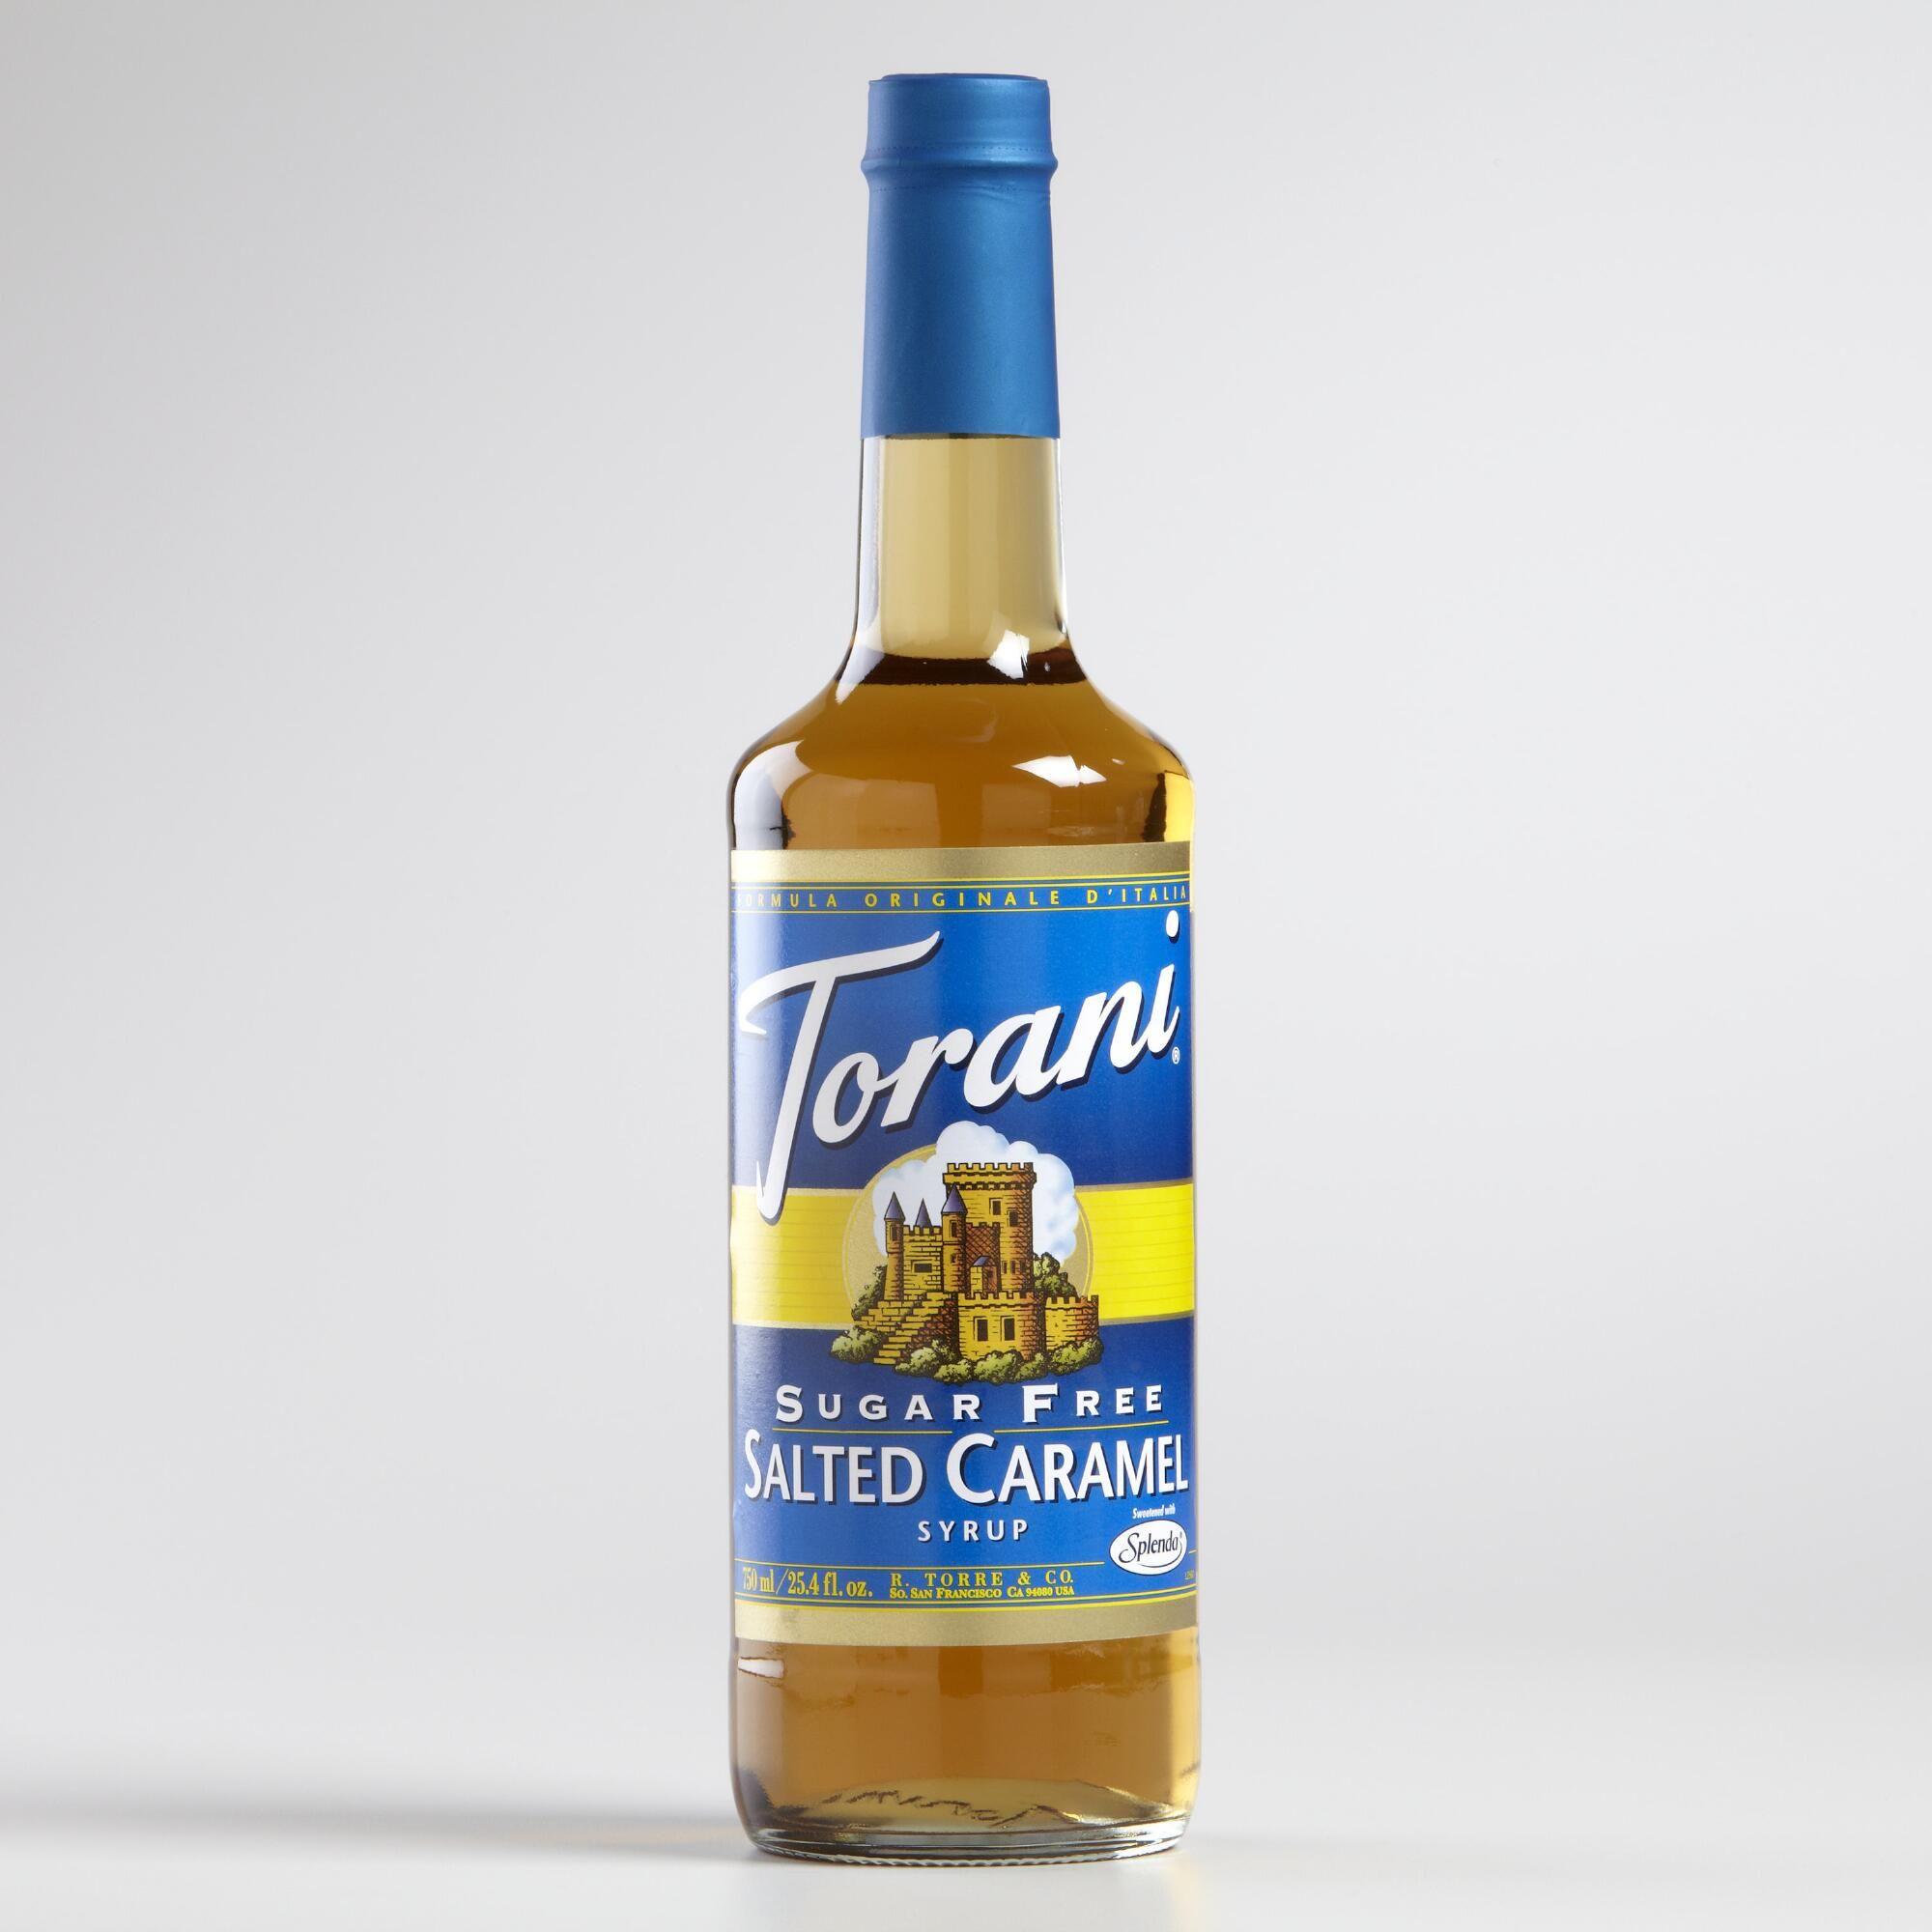 Torani Sugar Free Salted Caramel Syrup Sugar free